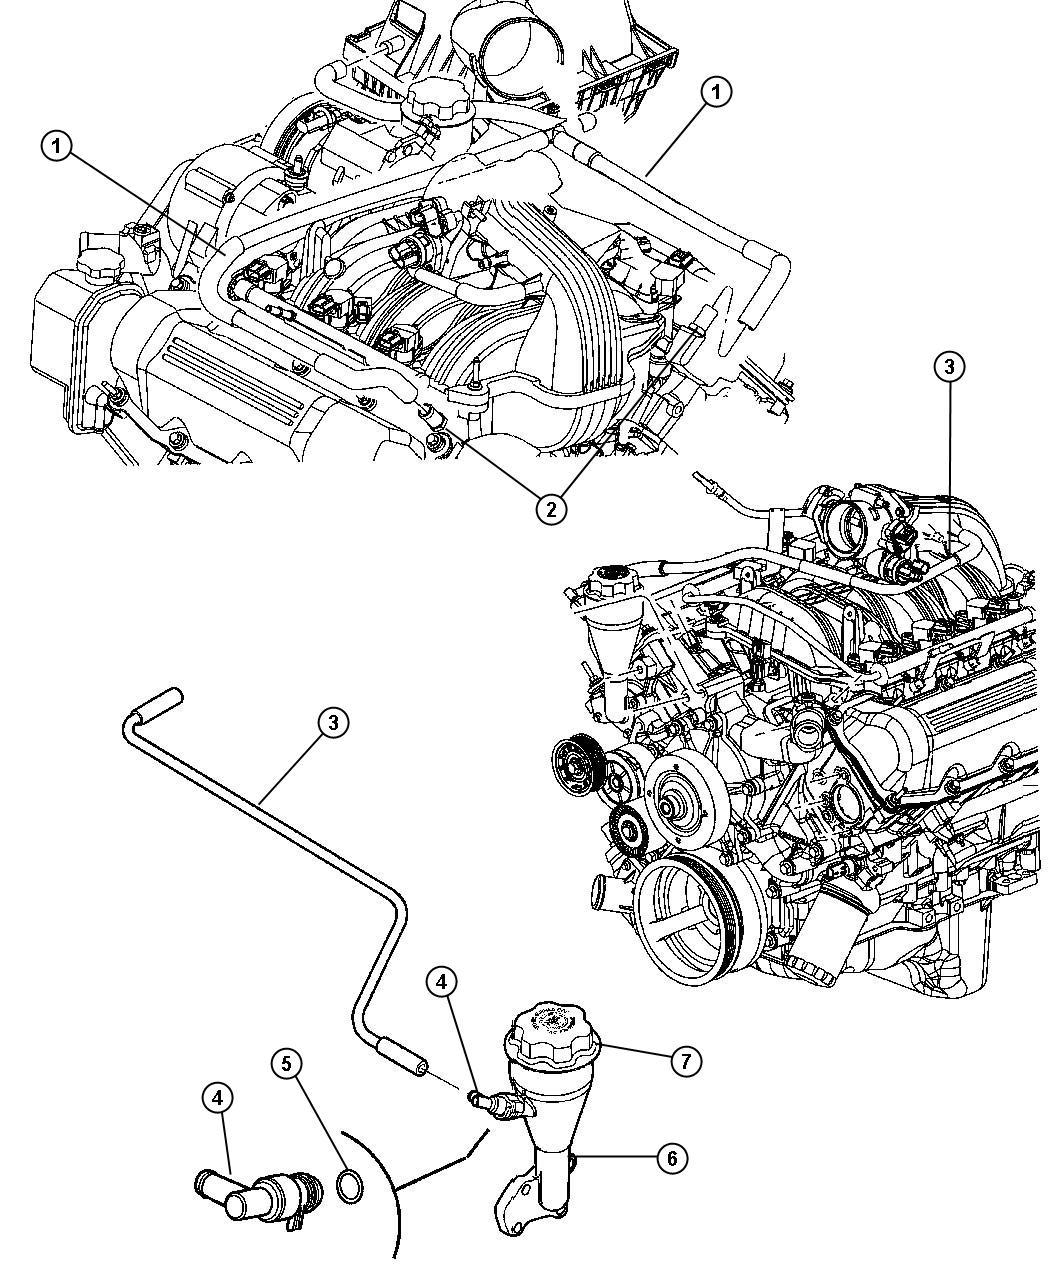 Dodge Viper Cap. Oil filler. Viscosity, marking